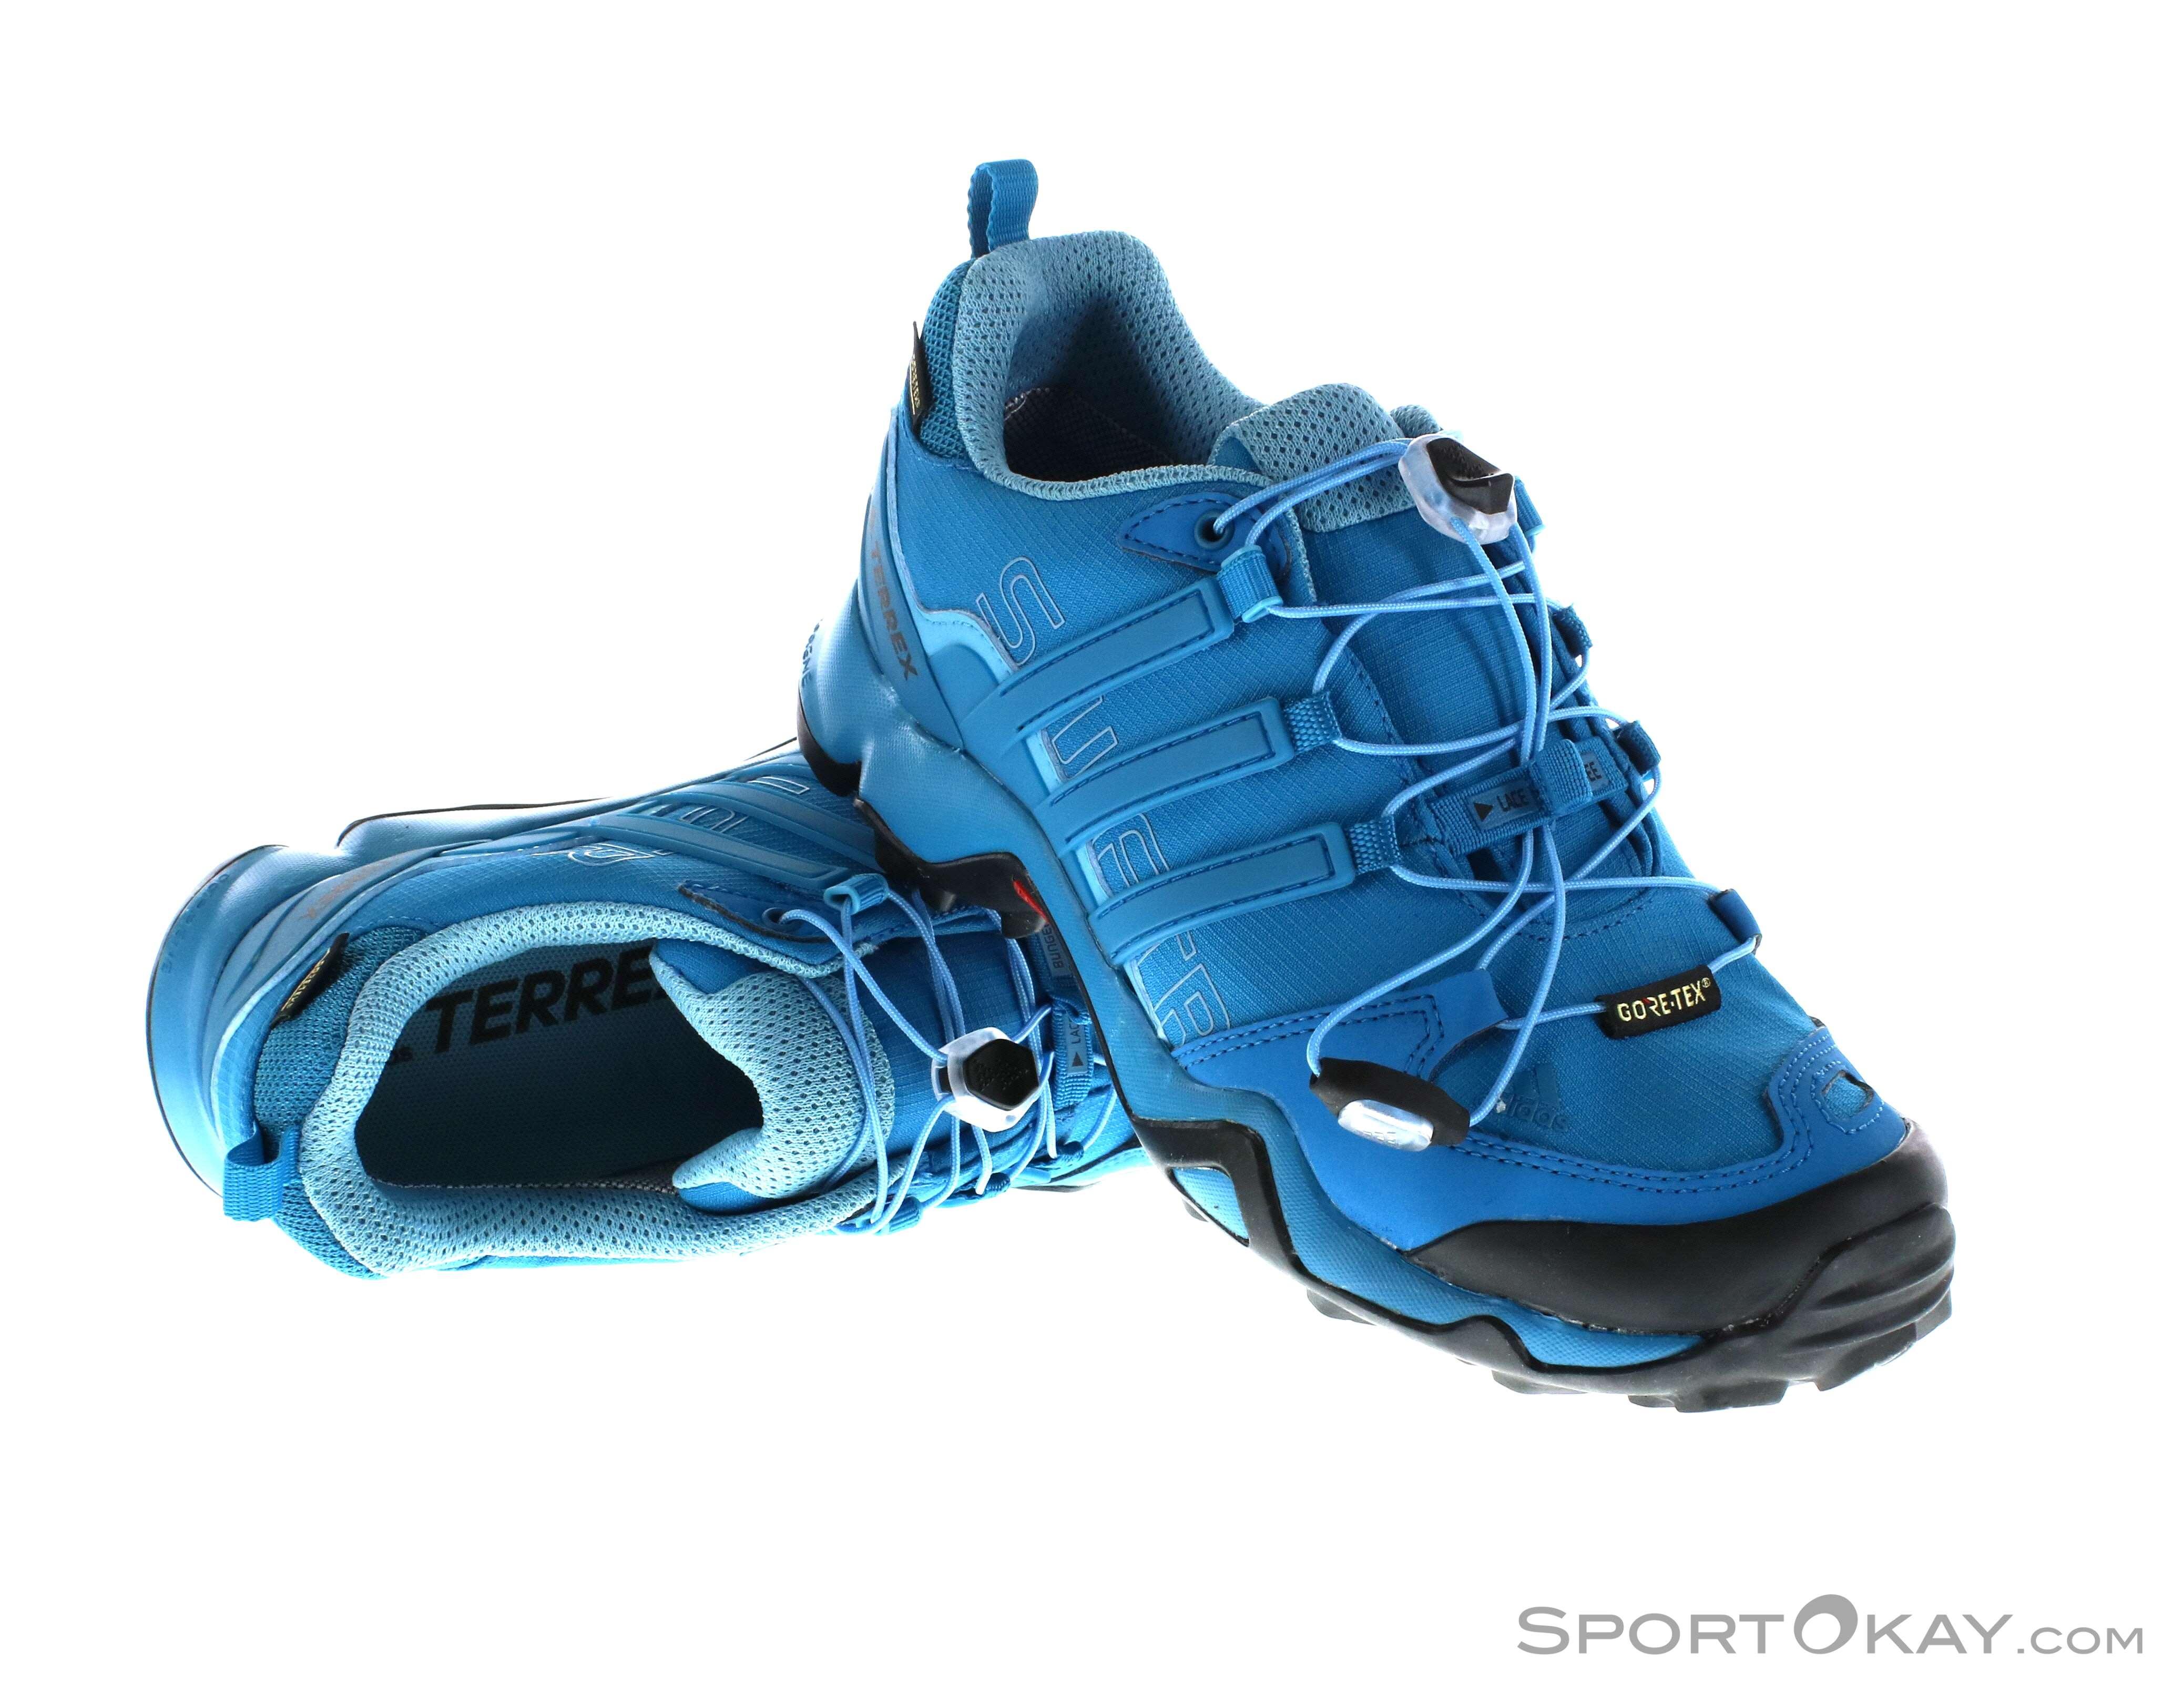 Adidas terrex swift r in gore - tex leukos